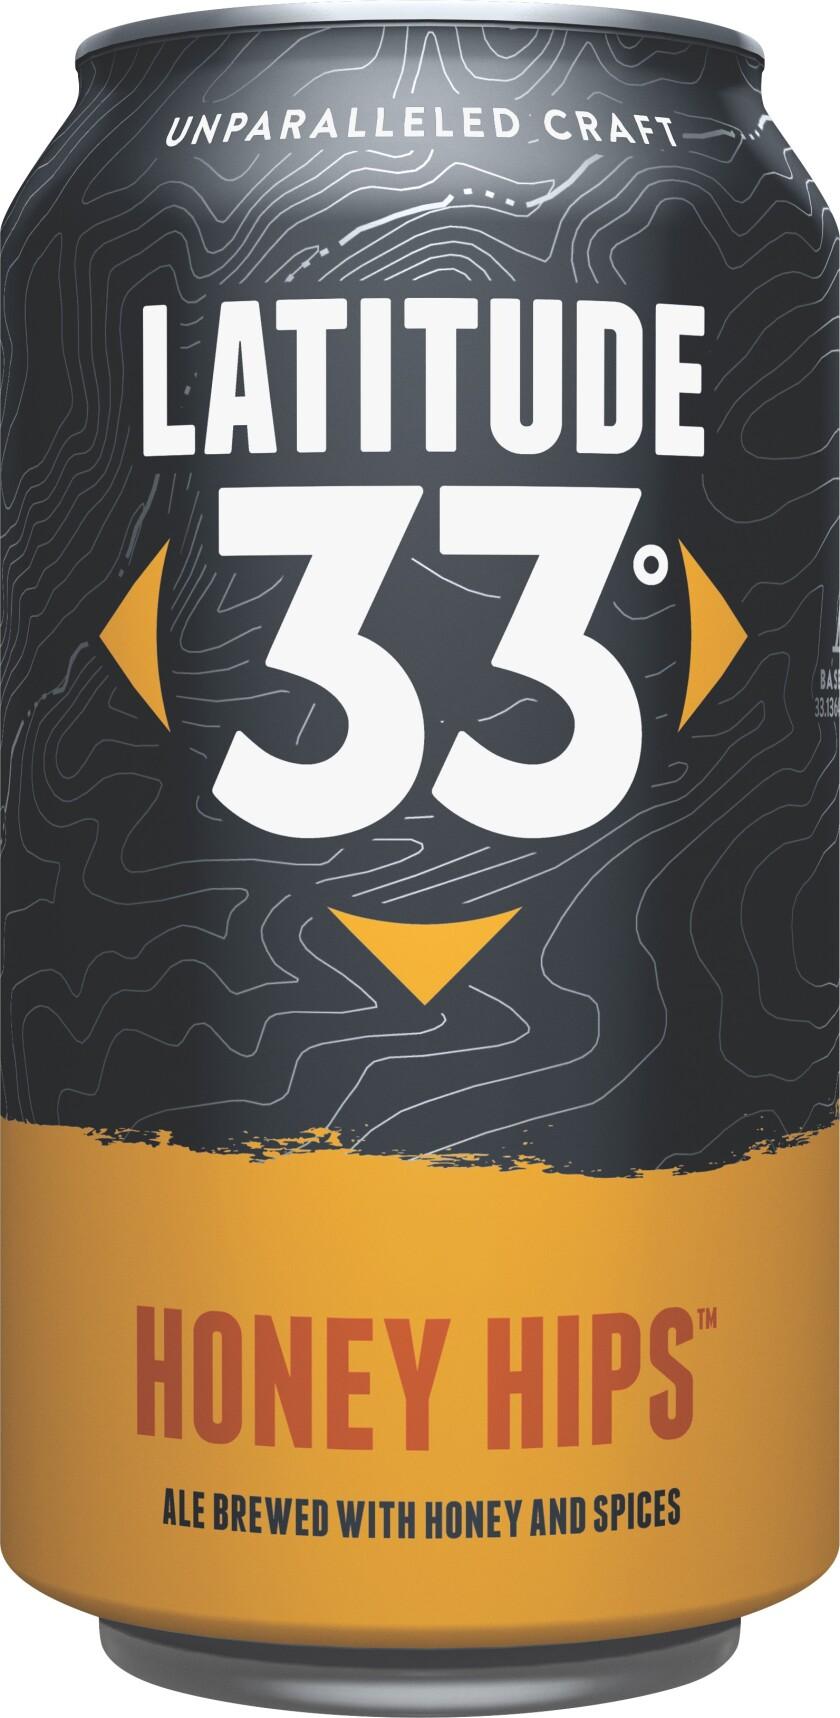 Latitude 33 HH Can.jpg